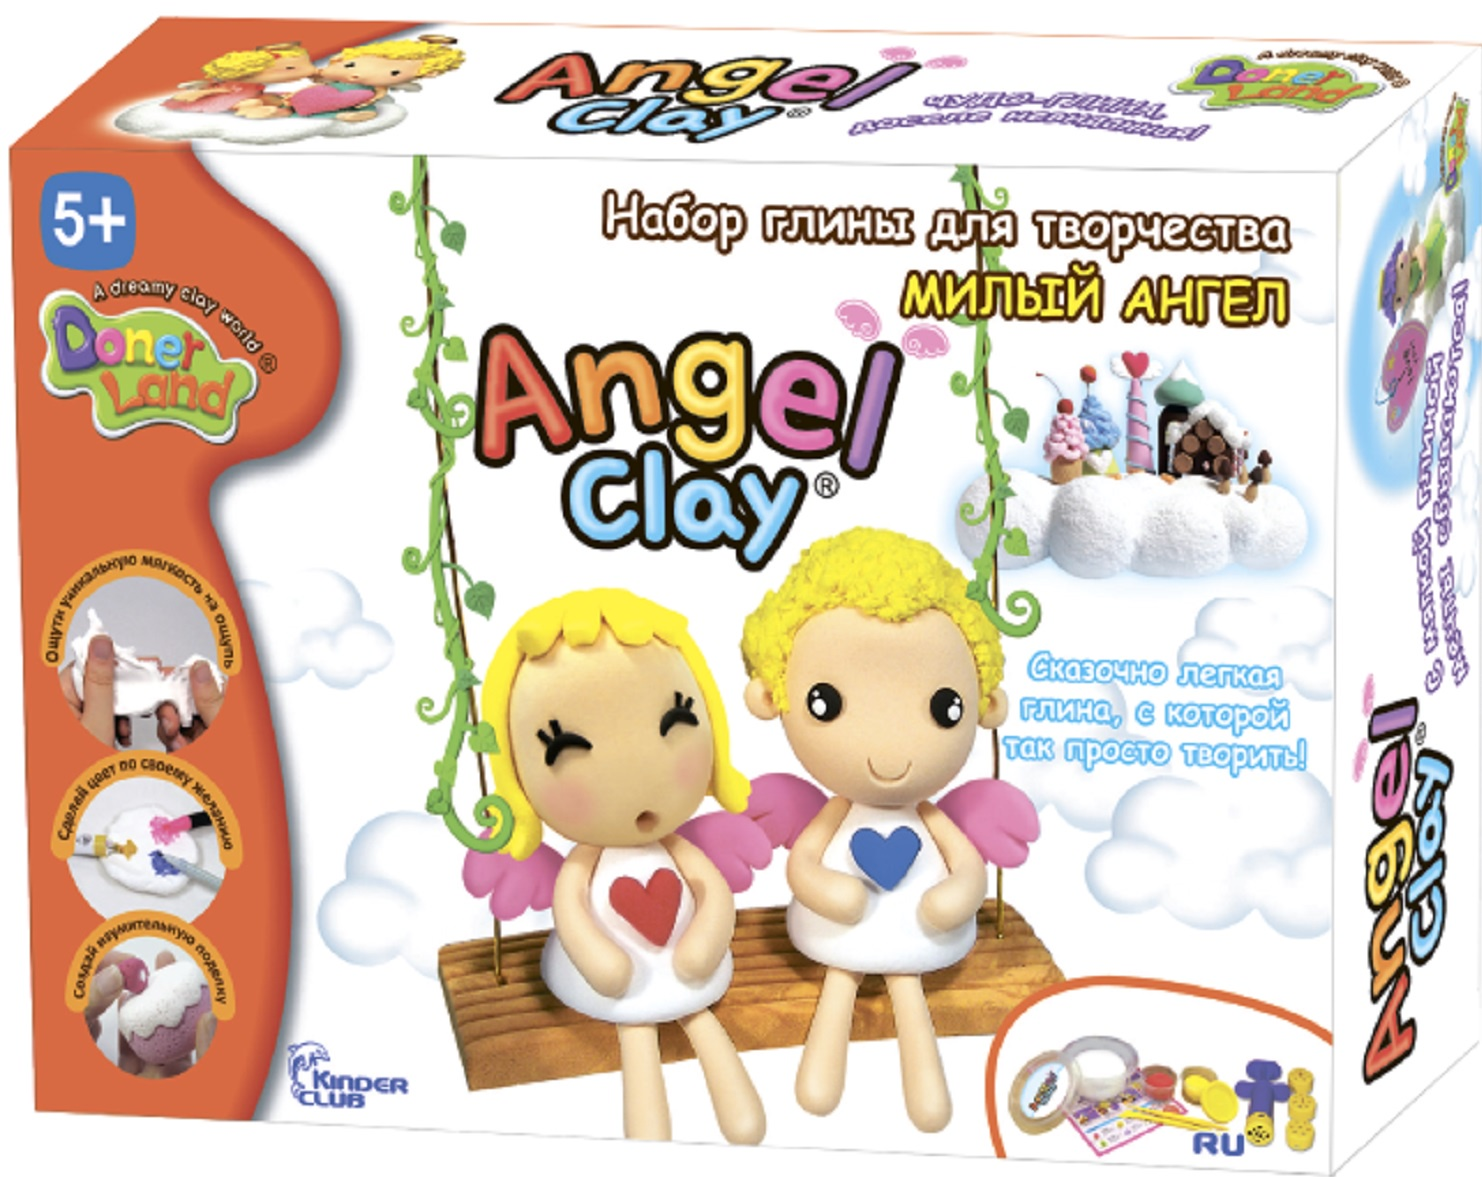 наборы для лепки angel clay набор для лепки angel clay шоколадная мастерская на русском языке Масса для лепки Angel Clay Милый ангел